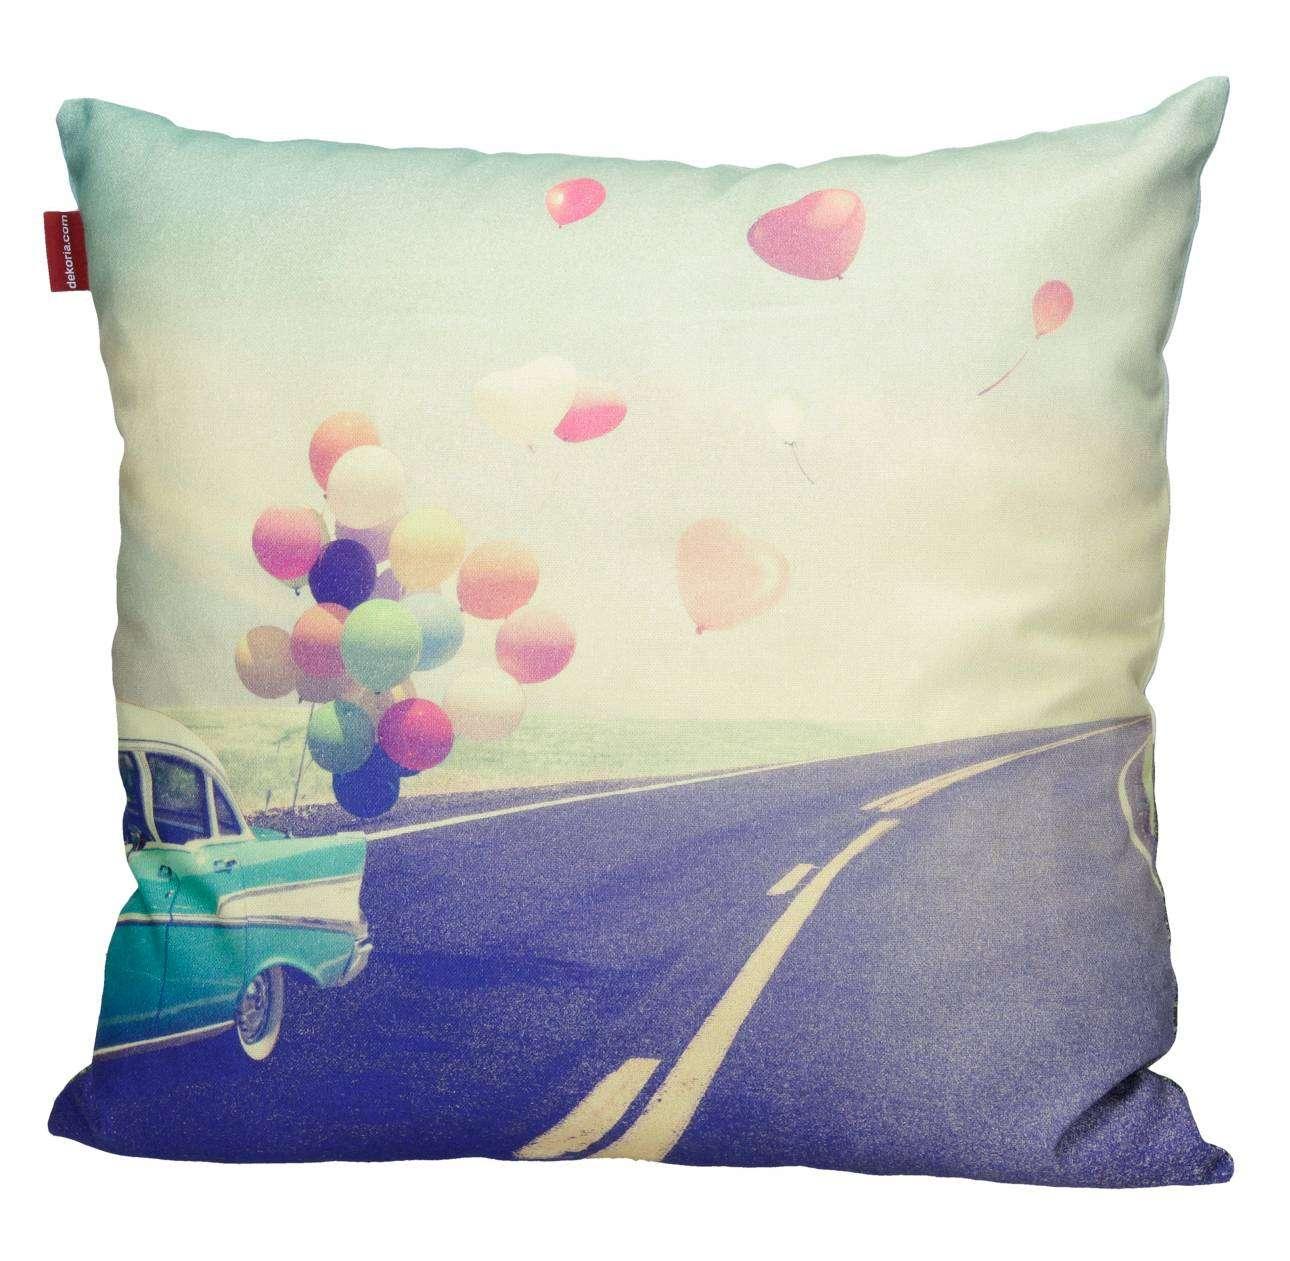 Kussenhoes Ballons 45x45cm